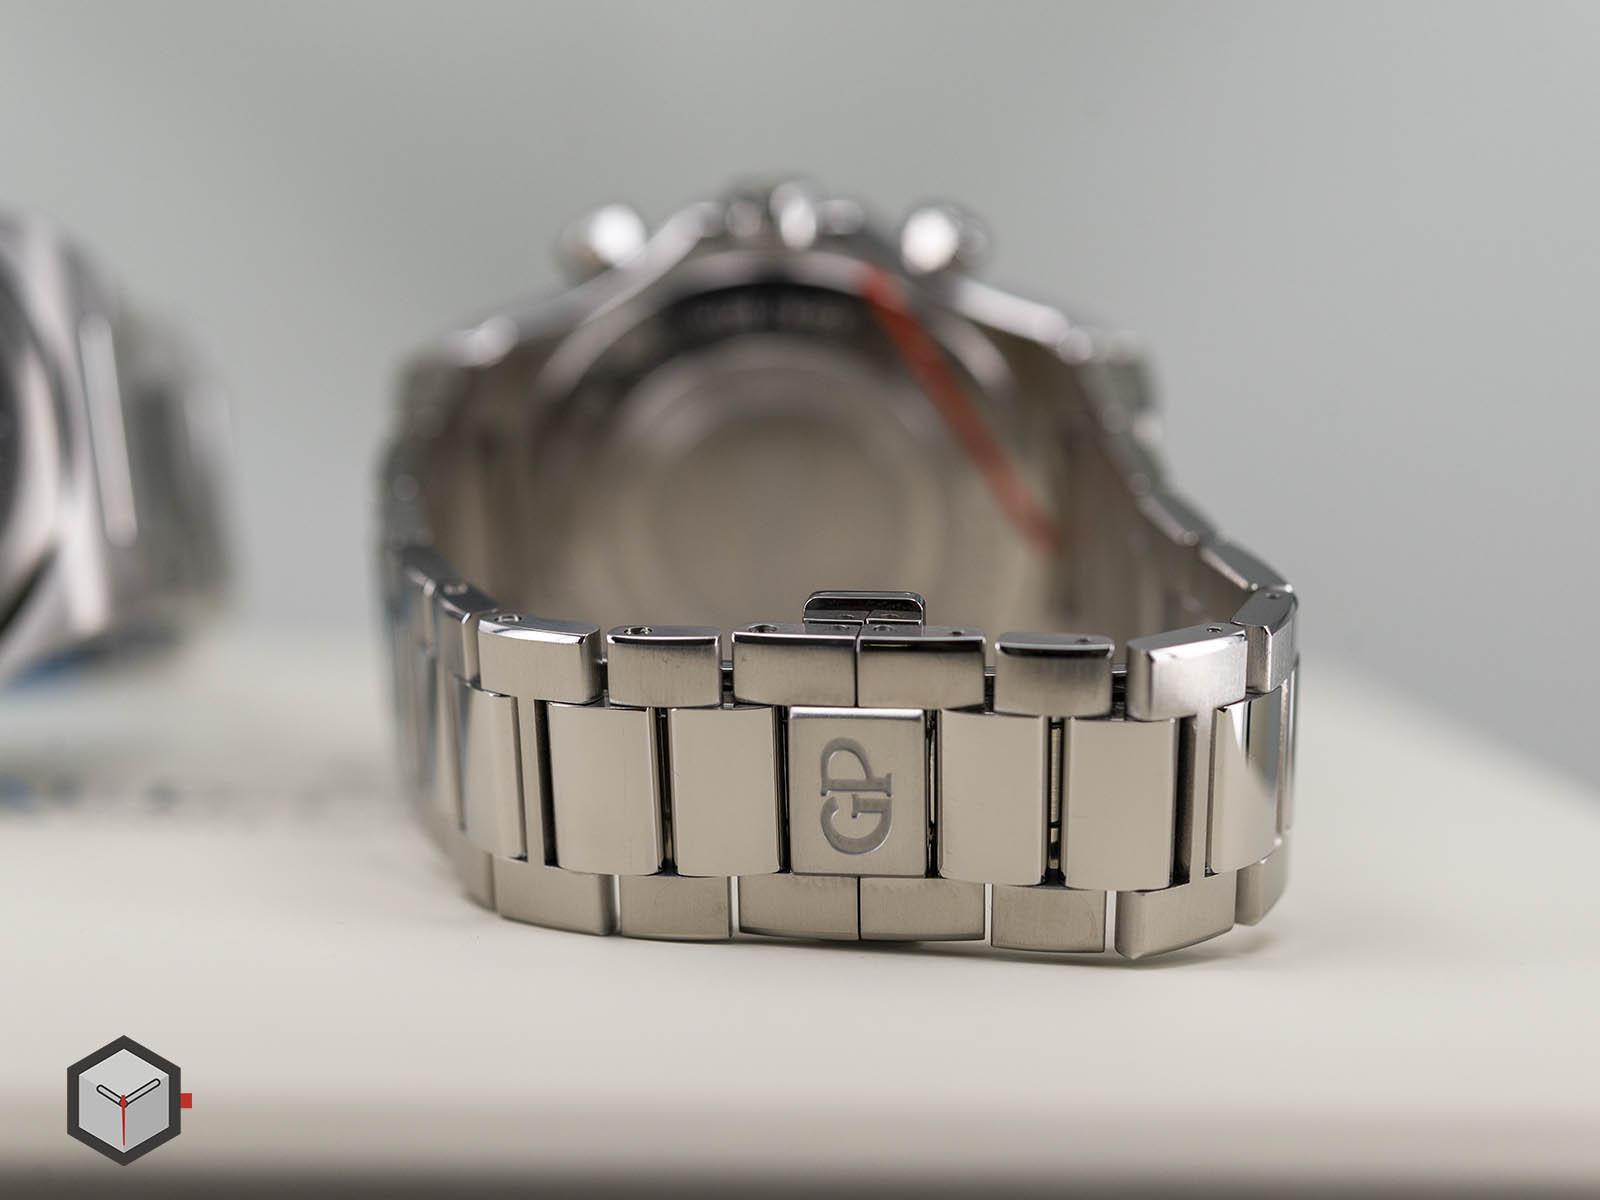 girard-perregaux-laureato-chronograph-42-mm-13.jpg